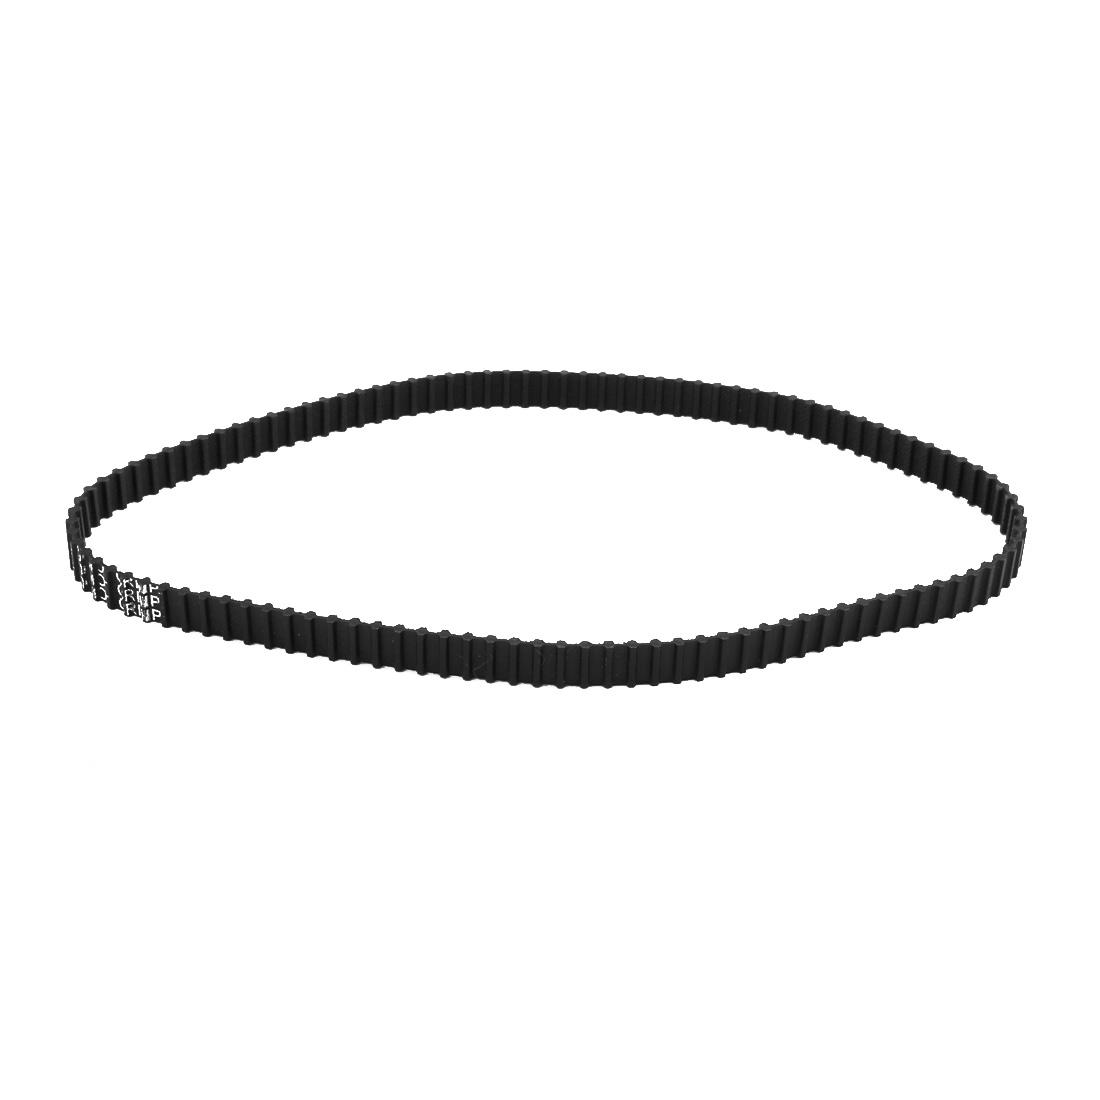 220DXL 110 Teeth 10mm x 5.08mm Double Side Rubber Timing Geared Belt for Motor